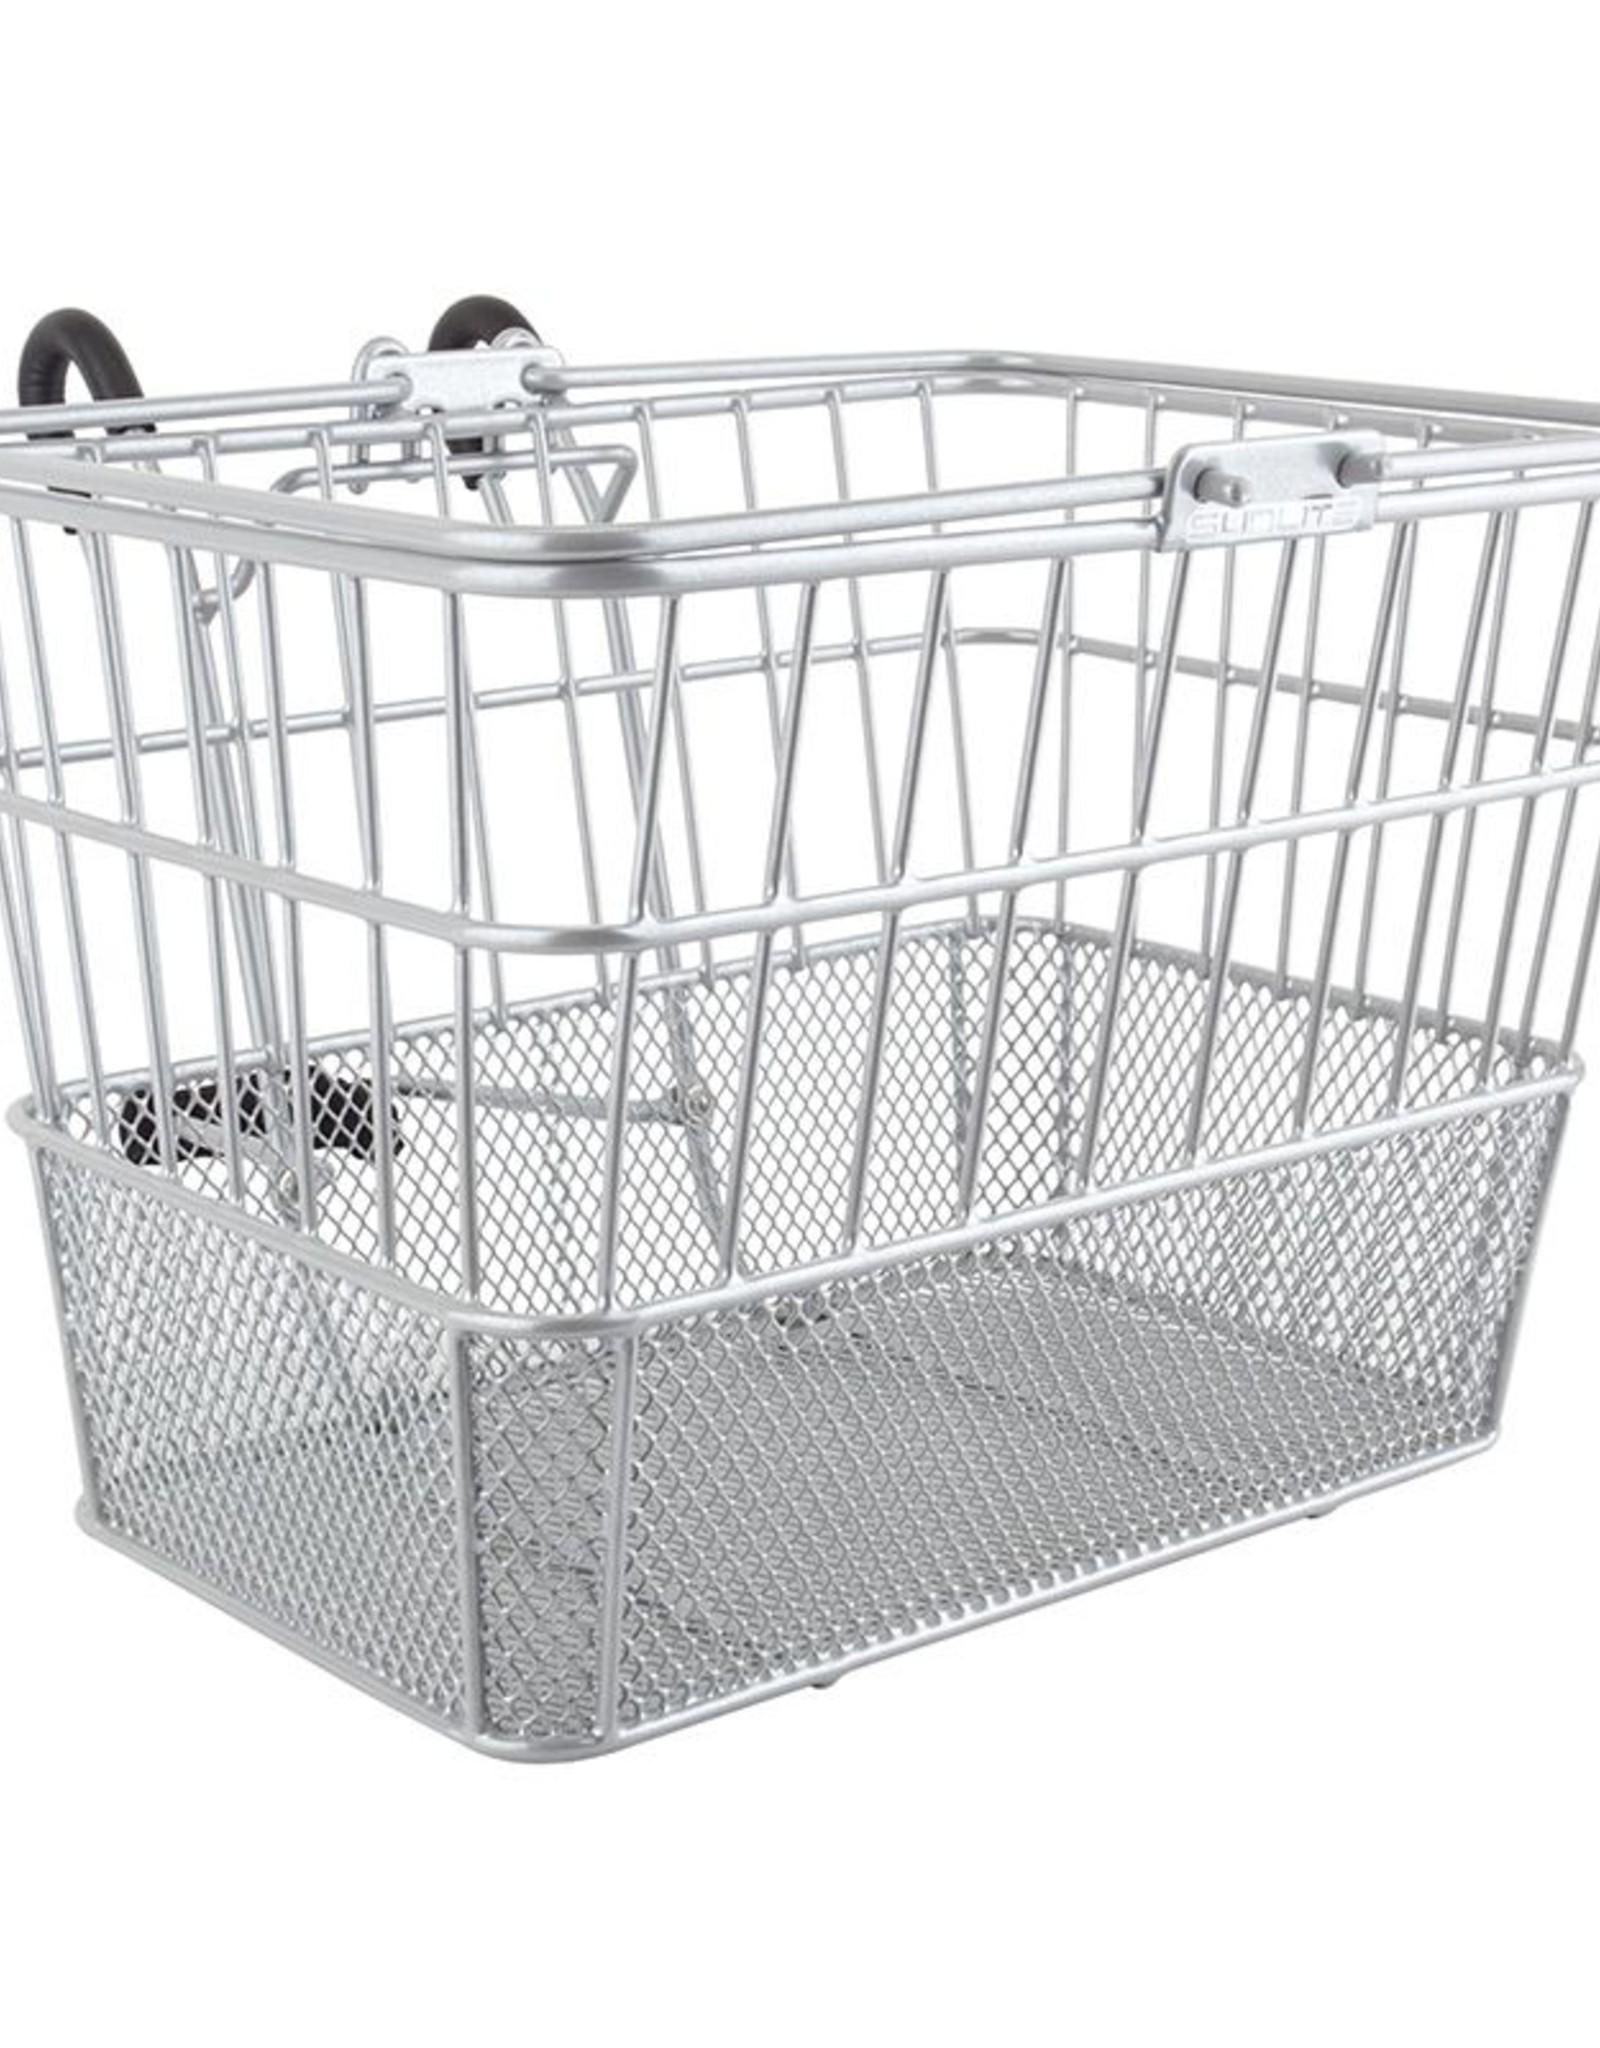 SunLite SunLite/ultracycle Mesh Bottom Lift-Off Basket Silver